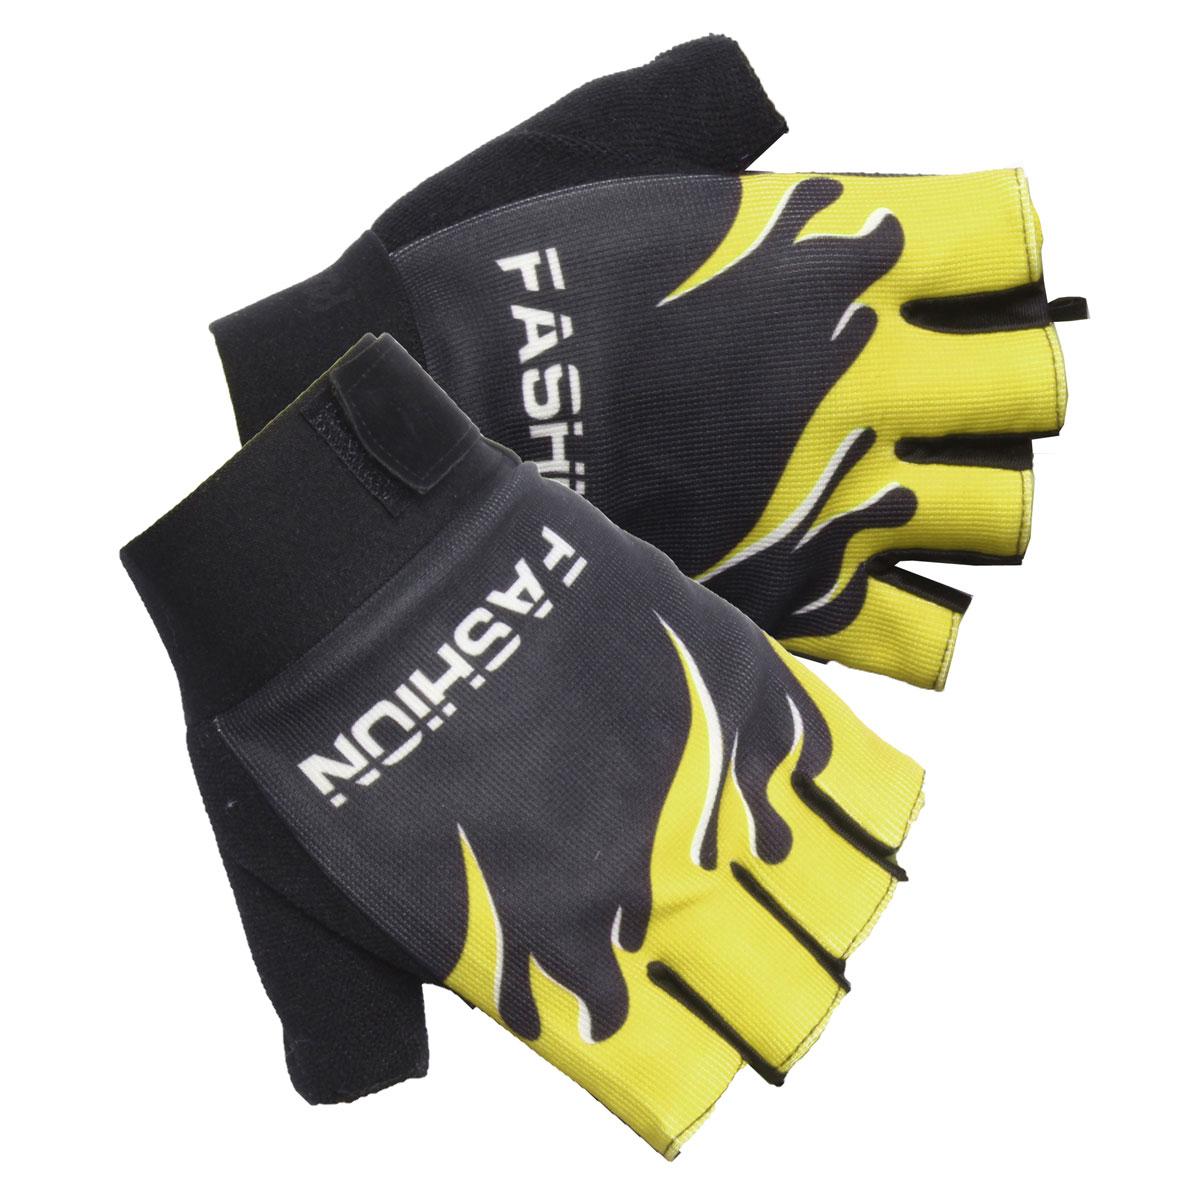 Sport Bike Hand Gloves: Outdoor Sports Cycling Bike Bicycle Motorcycle Gel Half